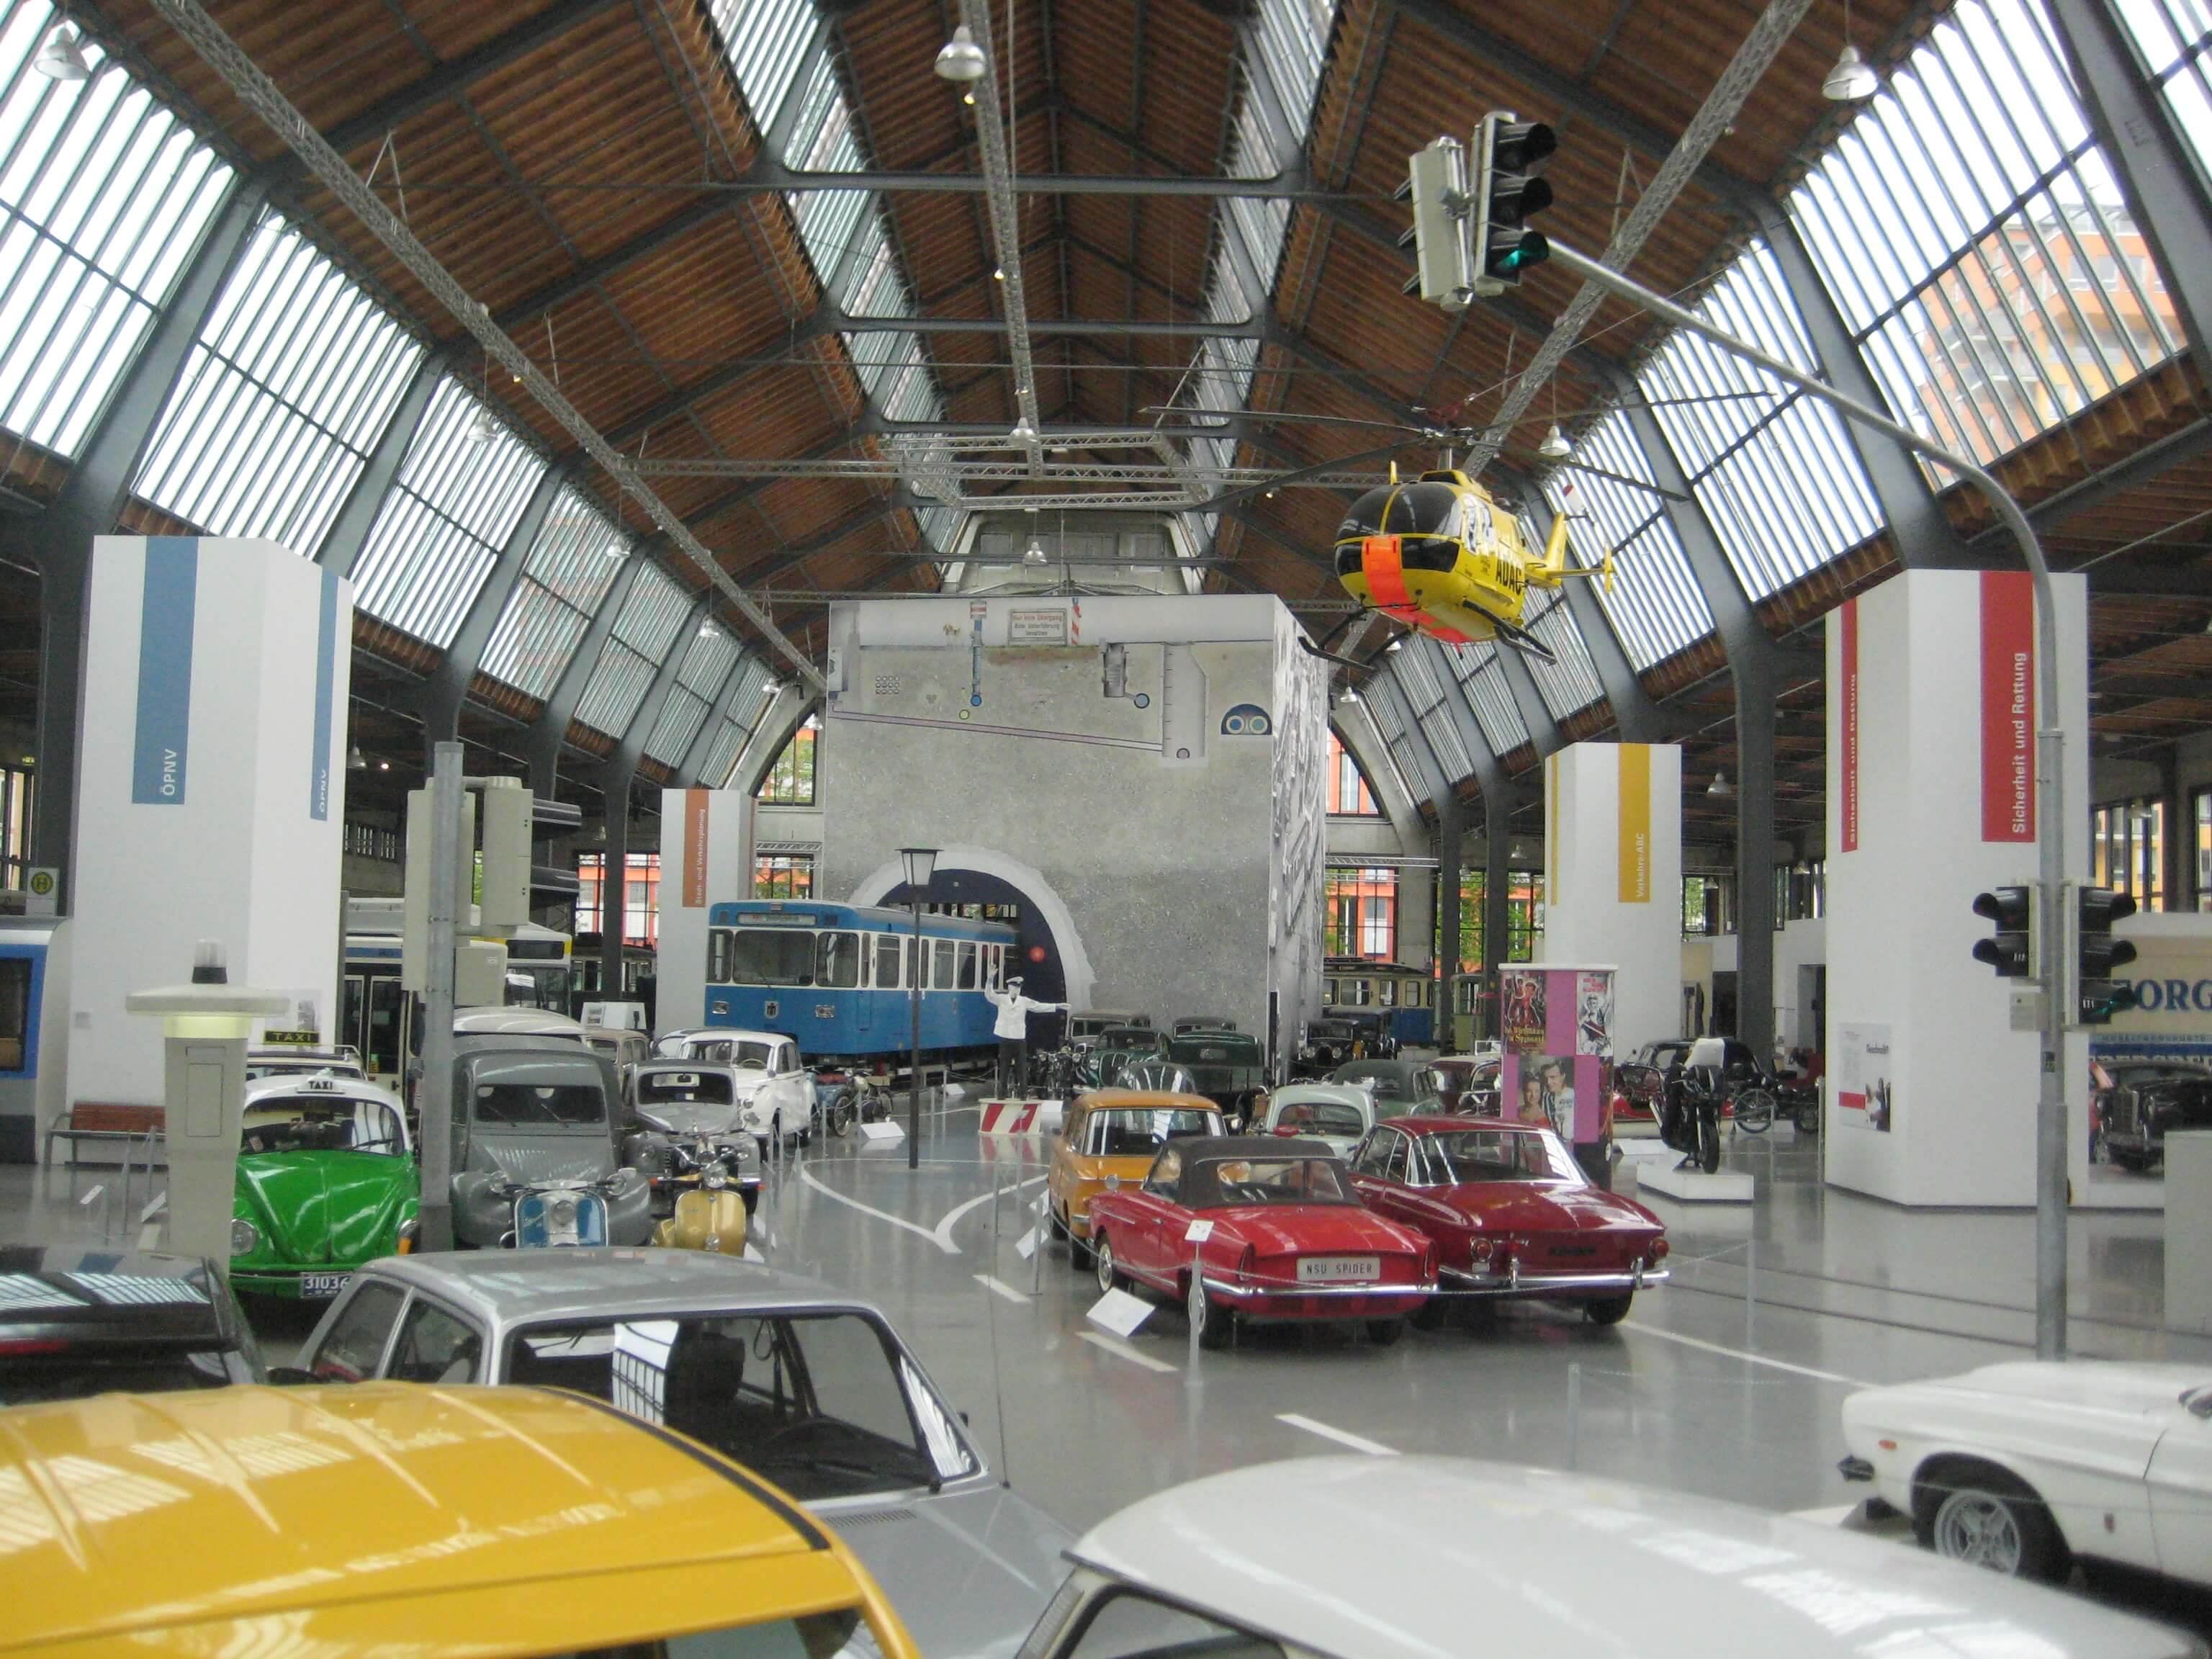 Verkehrsmuseum München